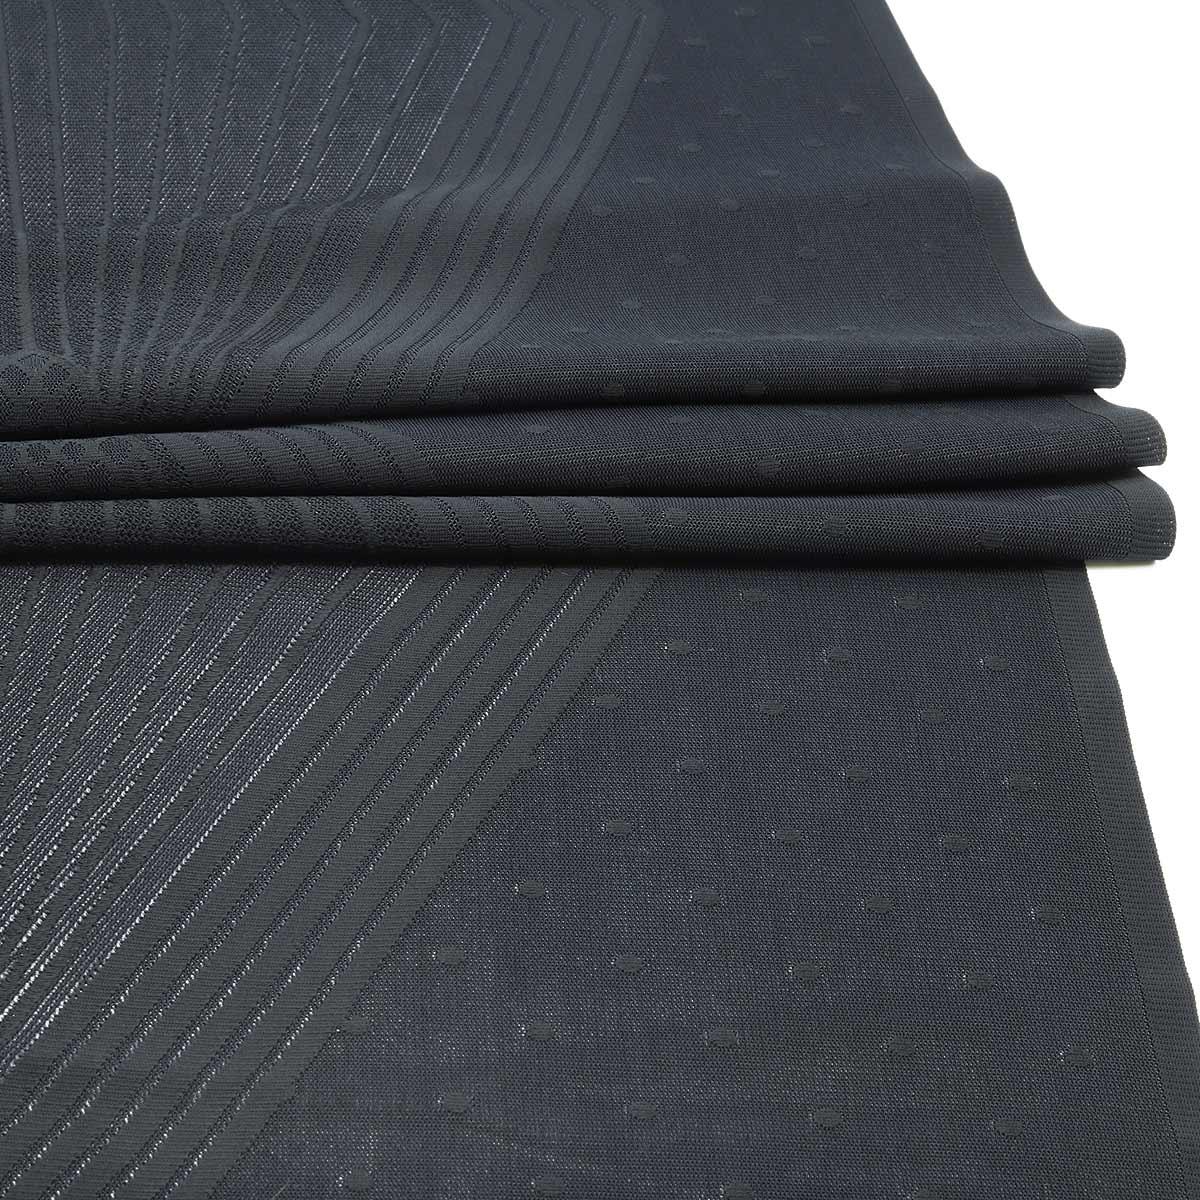 SU 114 Ткань эластичная бельевая 40 см*10